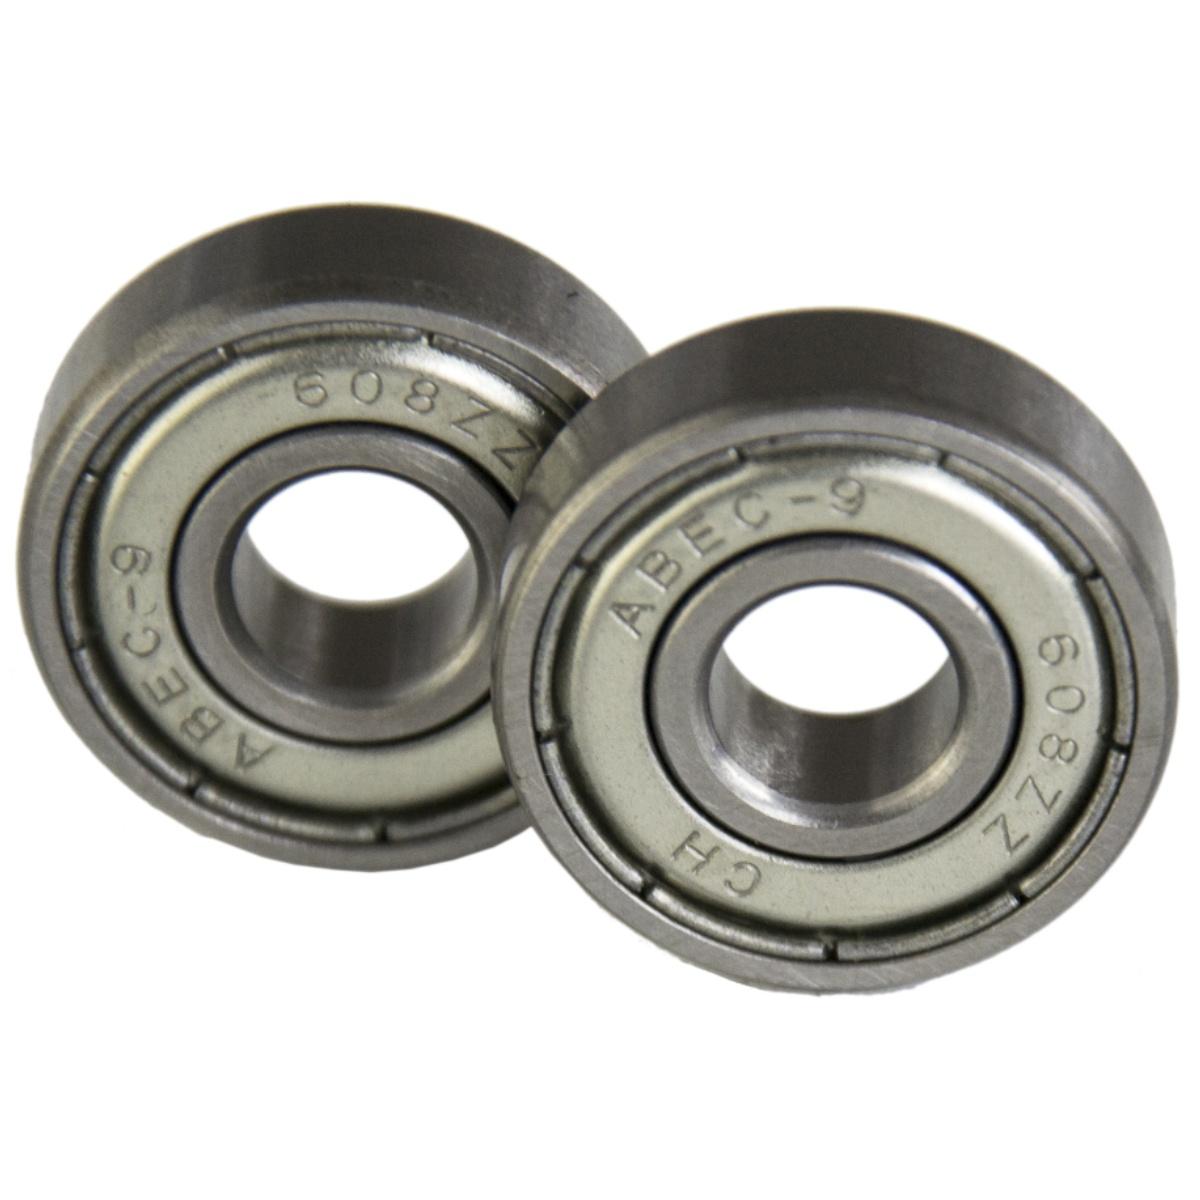 Ložiska NILS ABEC 9 Chrome steel